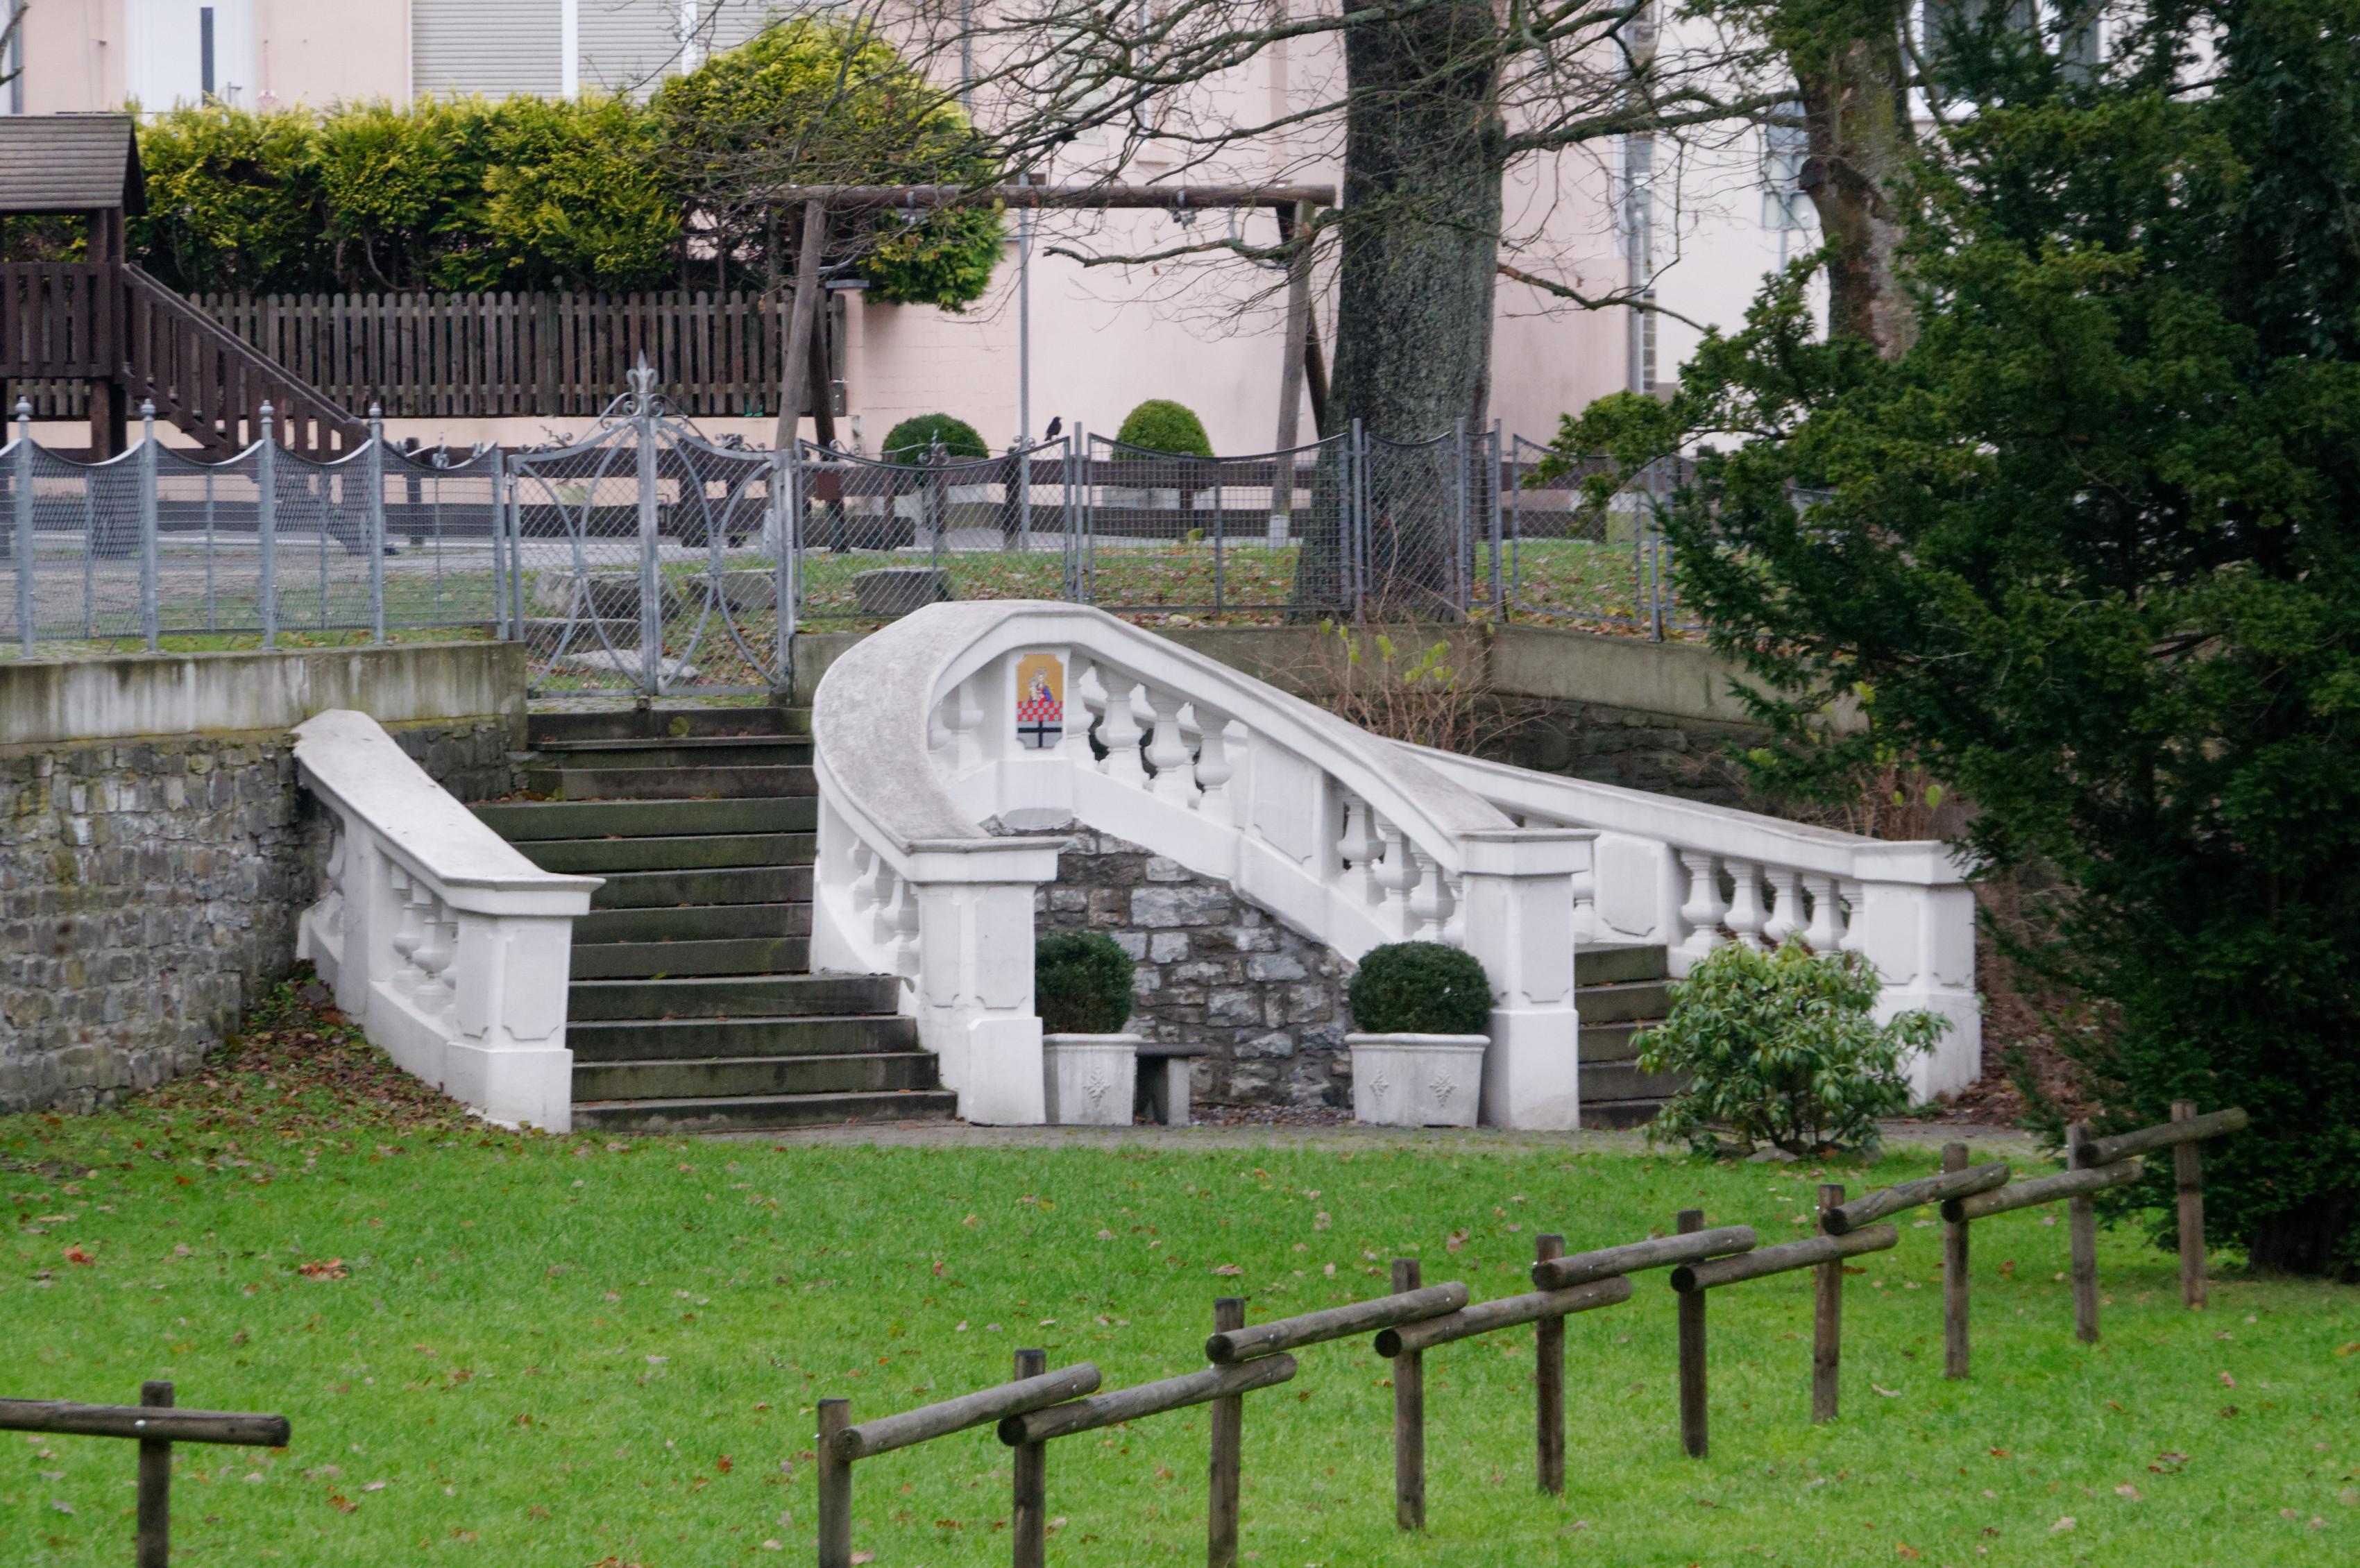 File:Neuenrade Treppe Villa Herfeld DSC 5188 PK